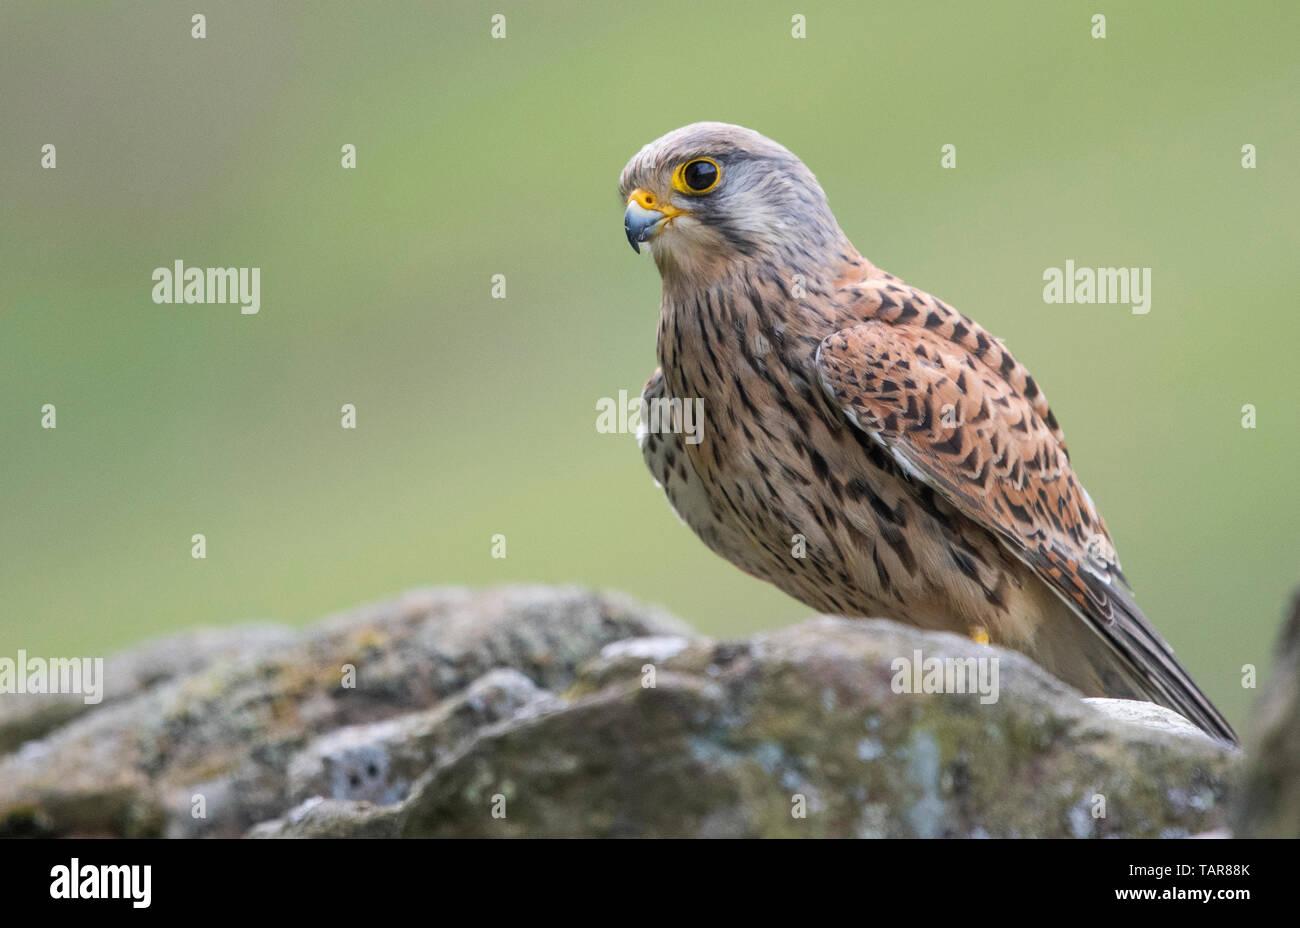 Female kestrel (Falco tinnunculus) on stone wall, United Kingdom - Stock Image